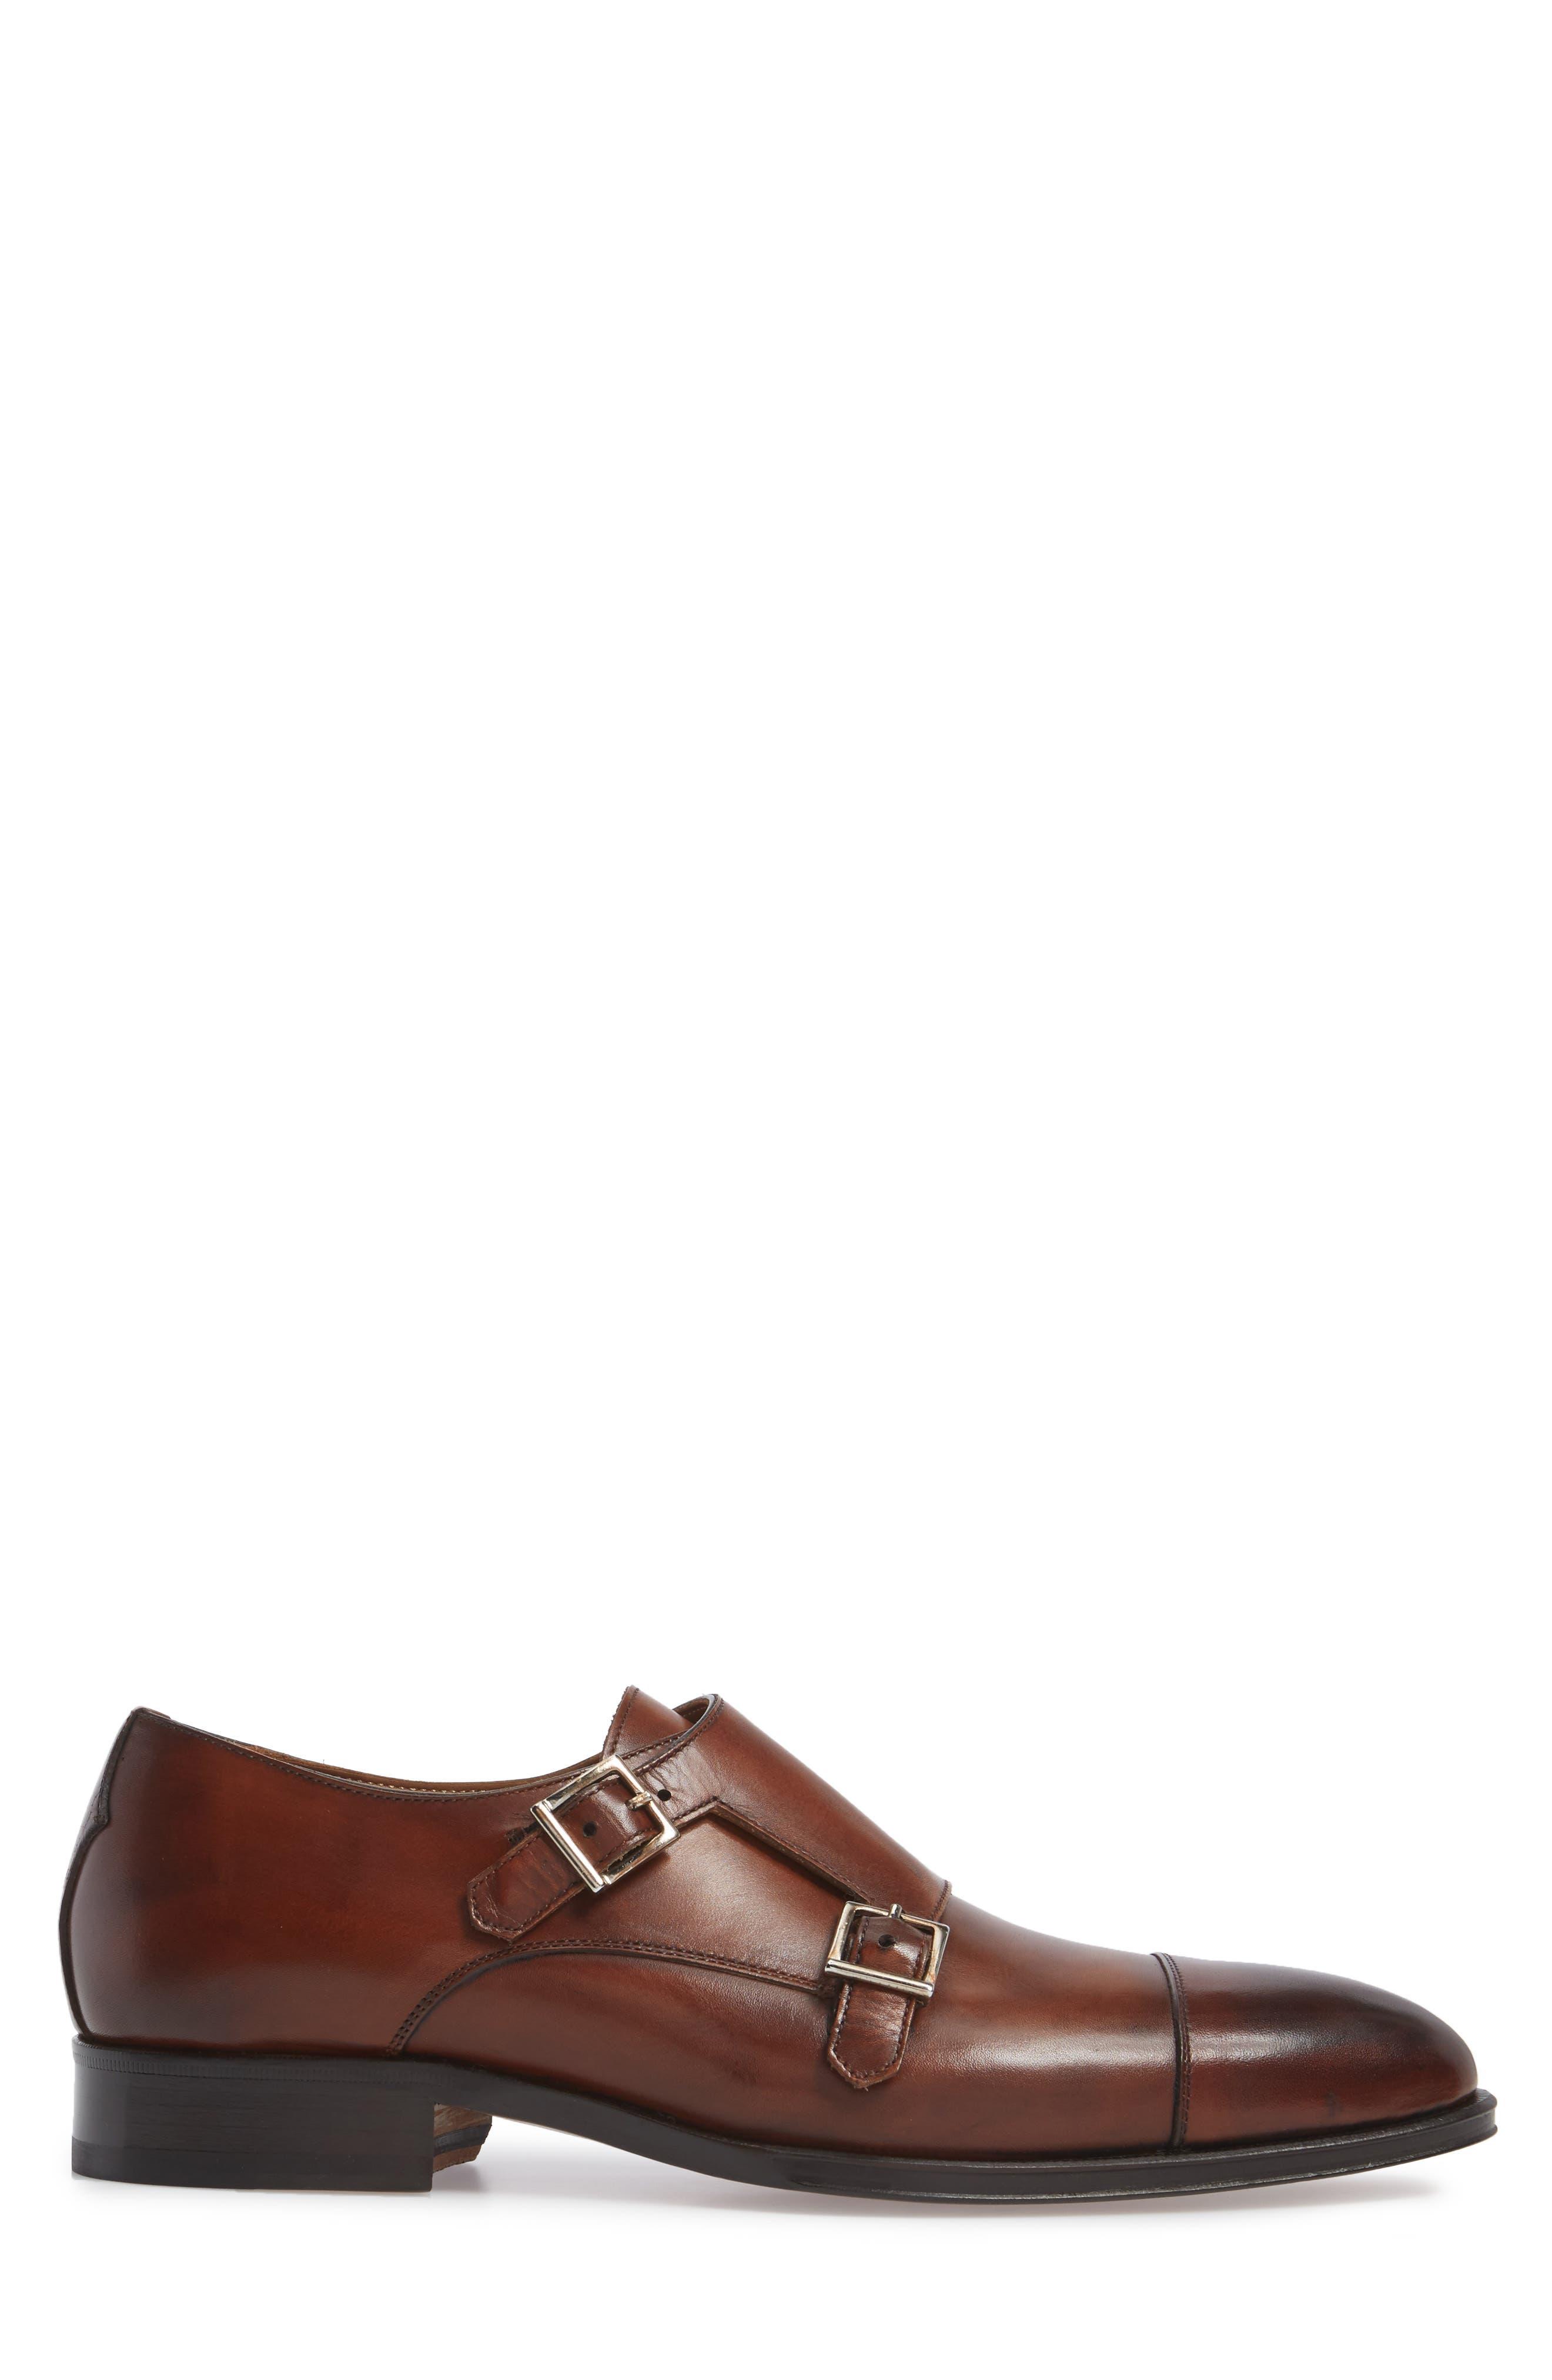 Gallo Bianco Double Monk Strap Shoe,                             Alternate thumbnail 3, color,                             201